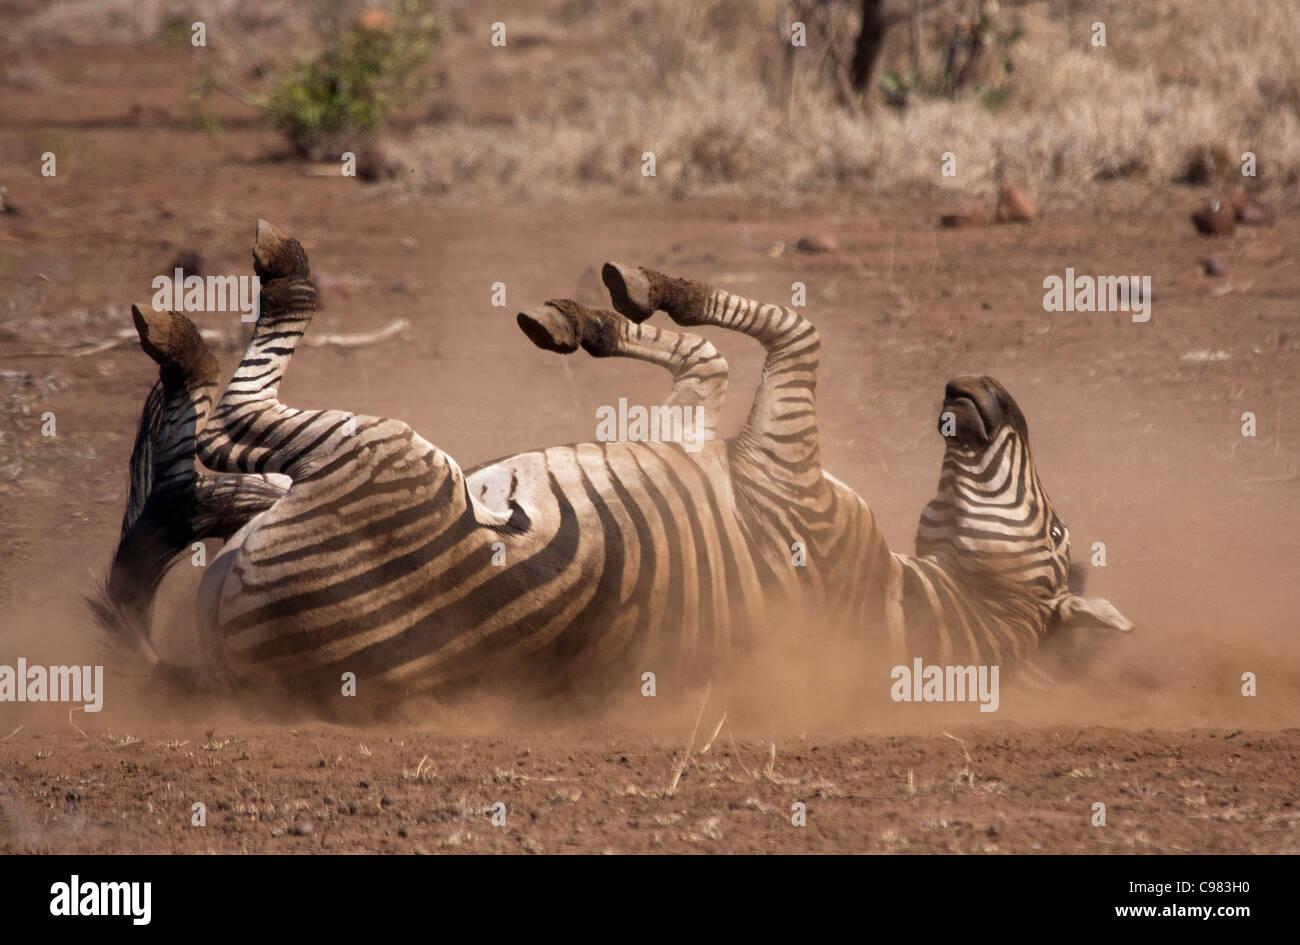 Zebra rolling in the dust - Stock Image